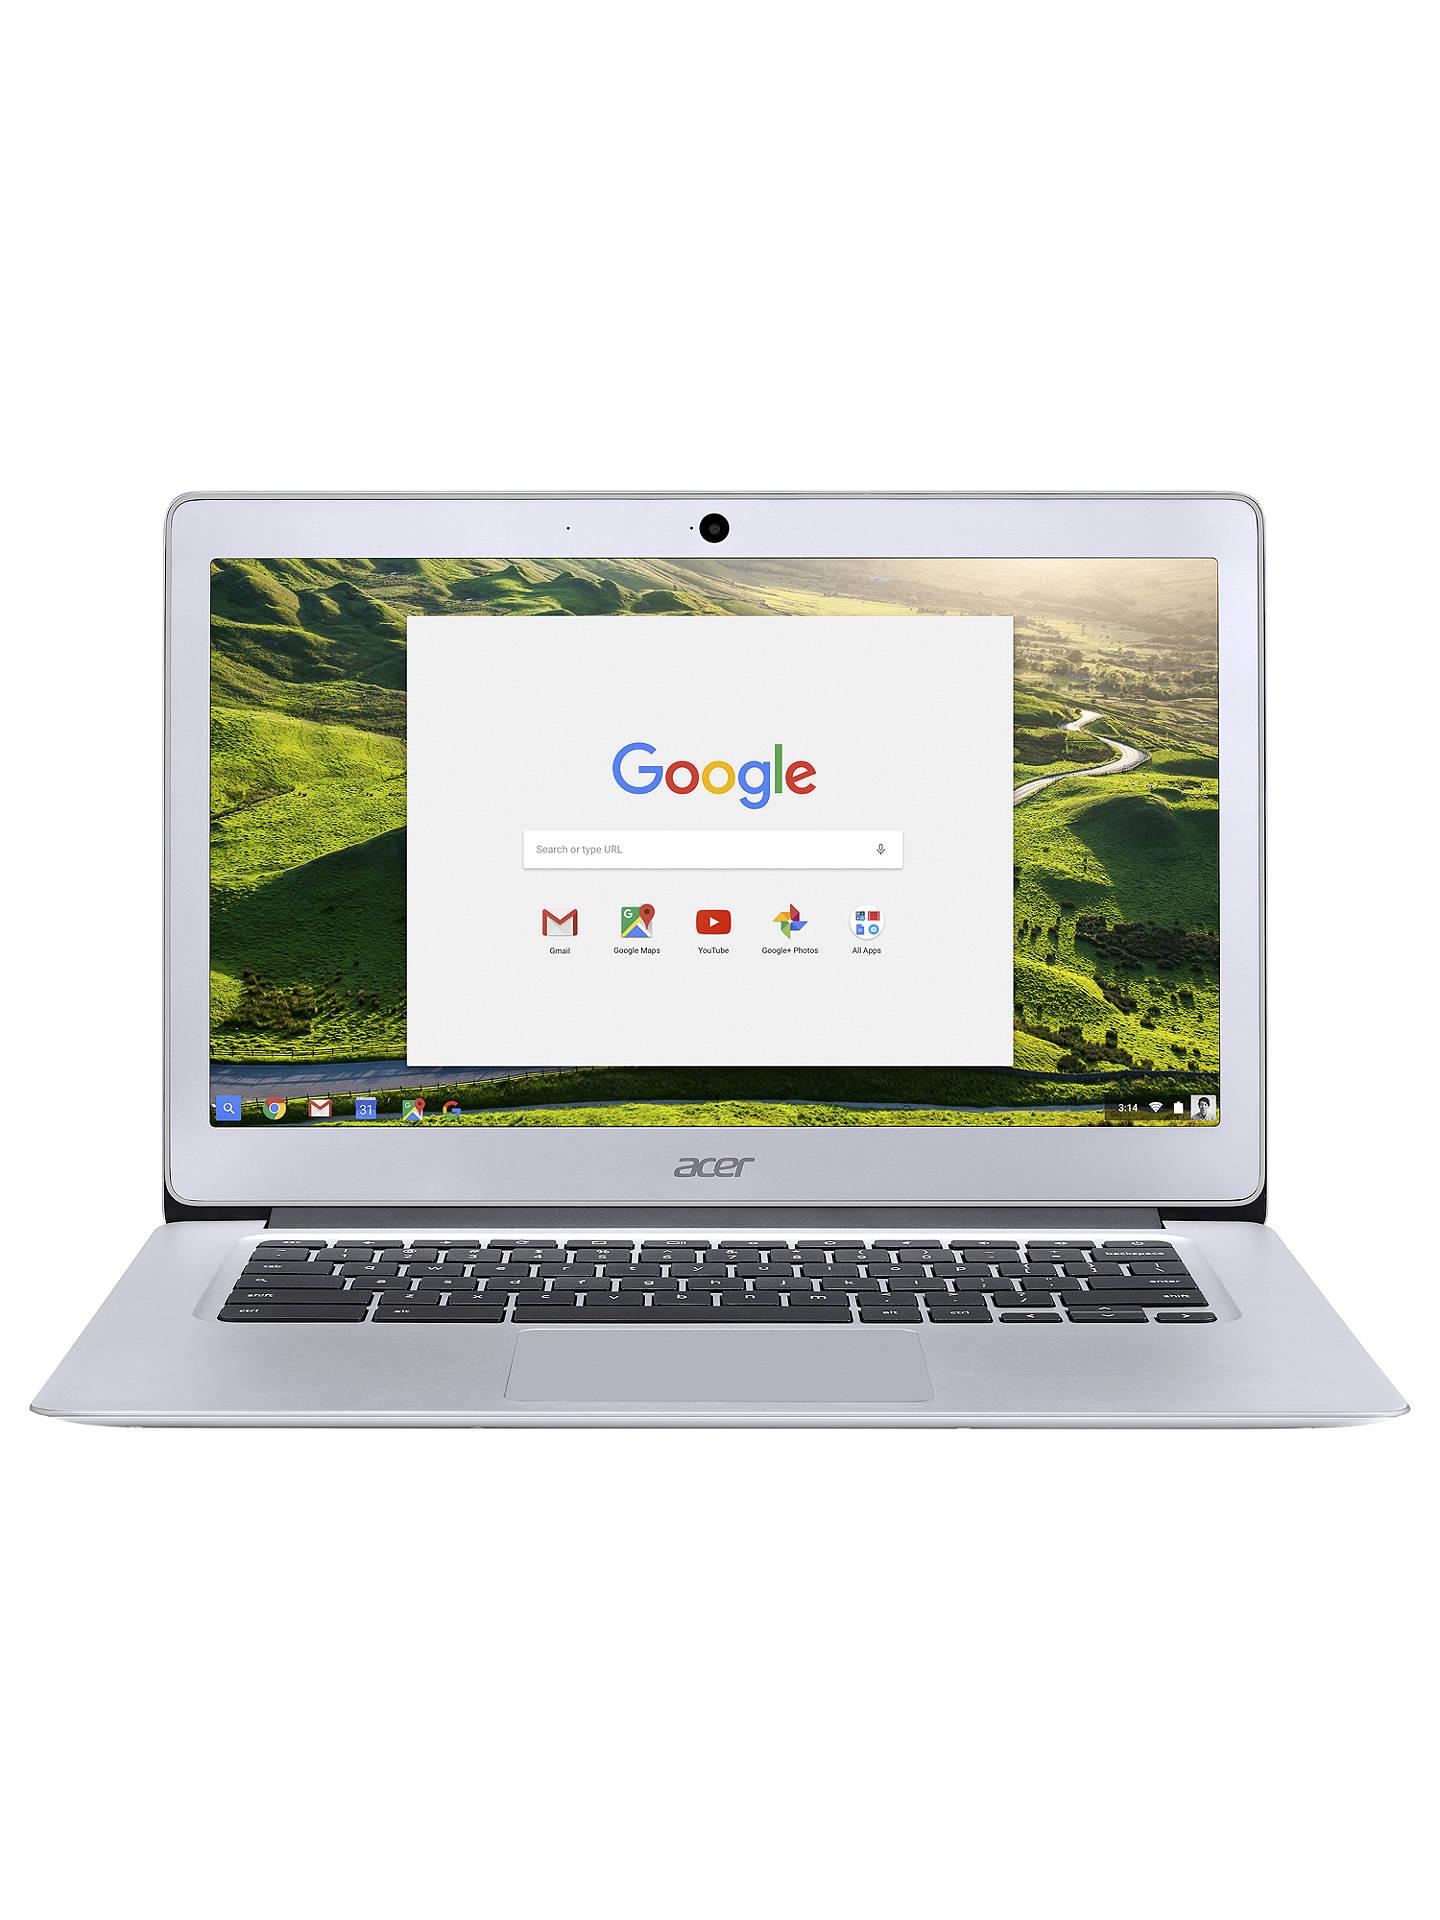 Acer Chromebook 14 CB3-431, Intel Celeron, 4GB RAM, 32GB eMMC Flash, 14